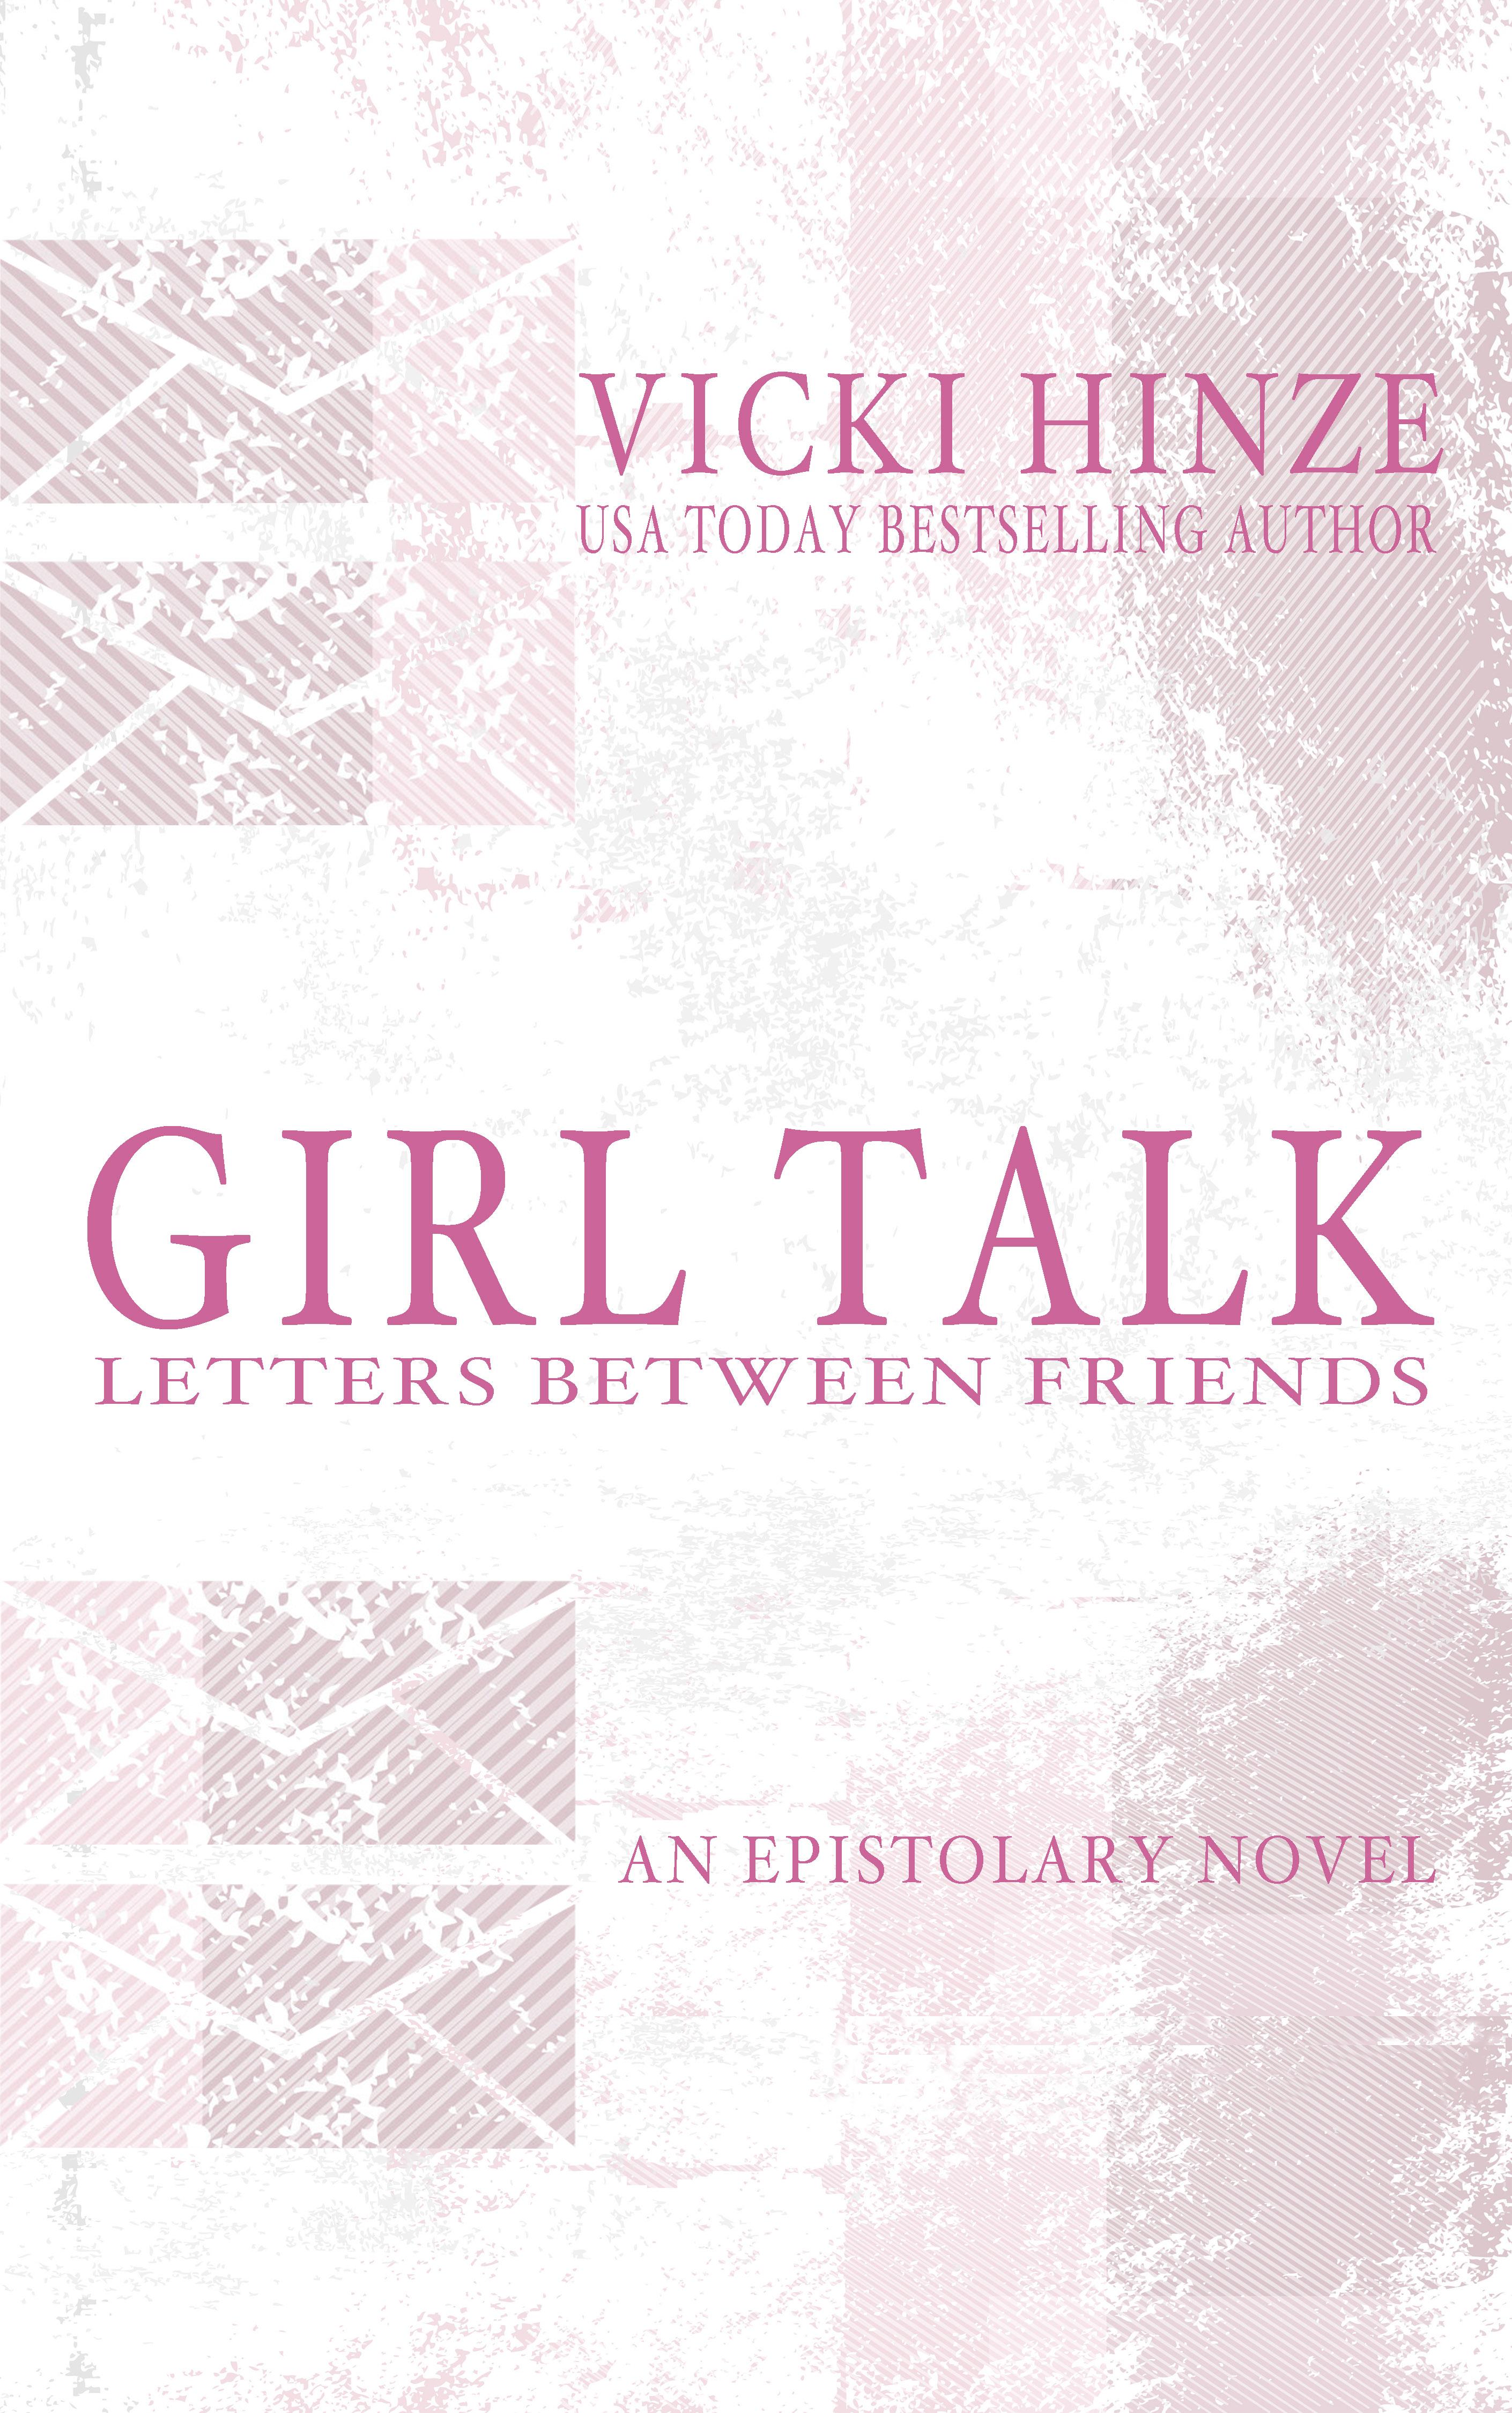 women's fiction, romantic suspense, epistolary novel, vicki hinze, kali kaye